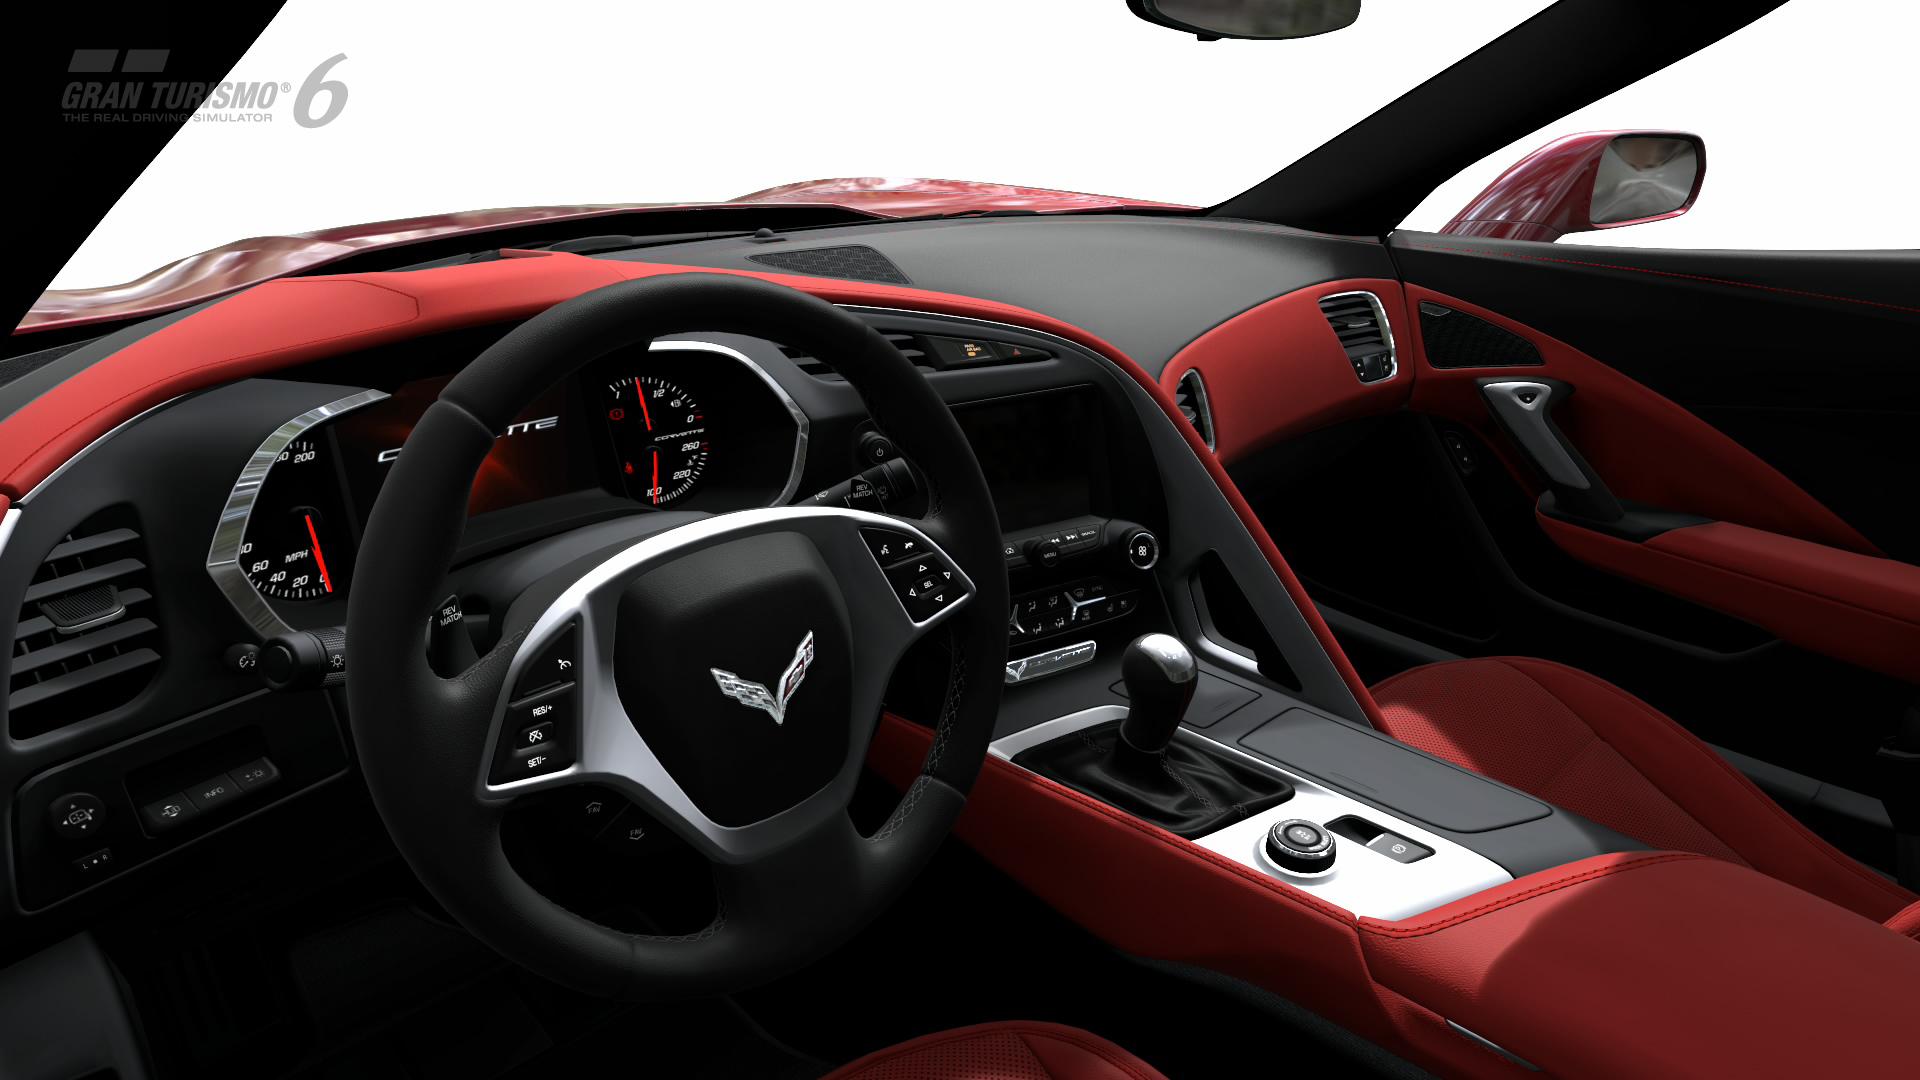 Foto de Gran Turismo 6 - 06/12/2013 (73/208)